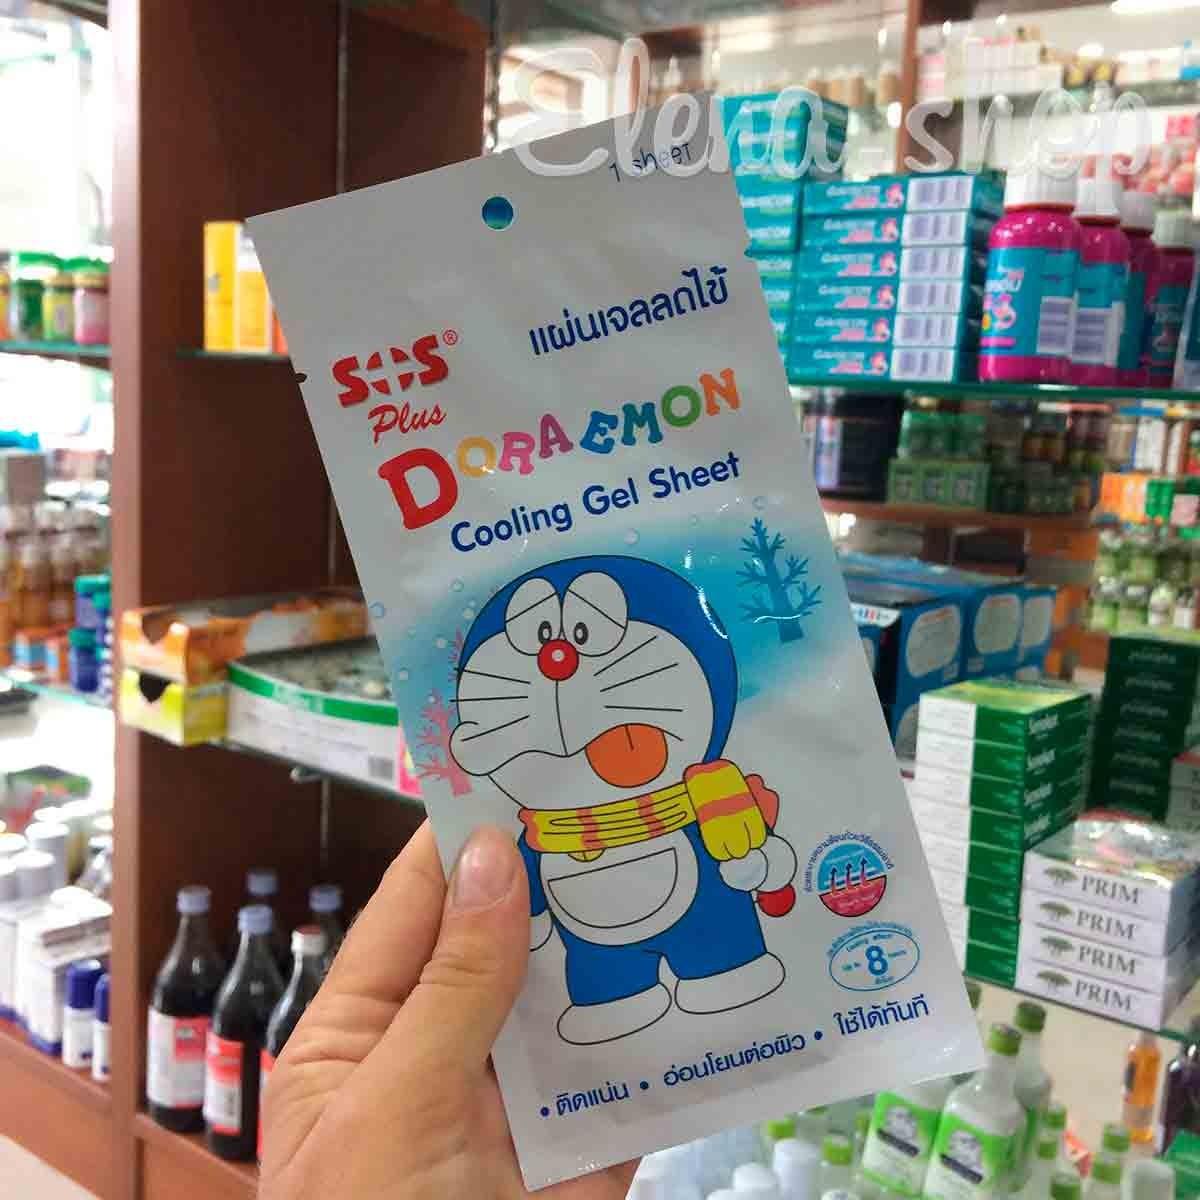 Охлаждающий пластырь Doraemon